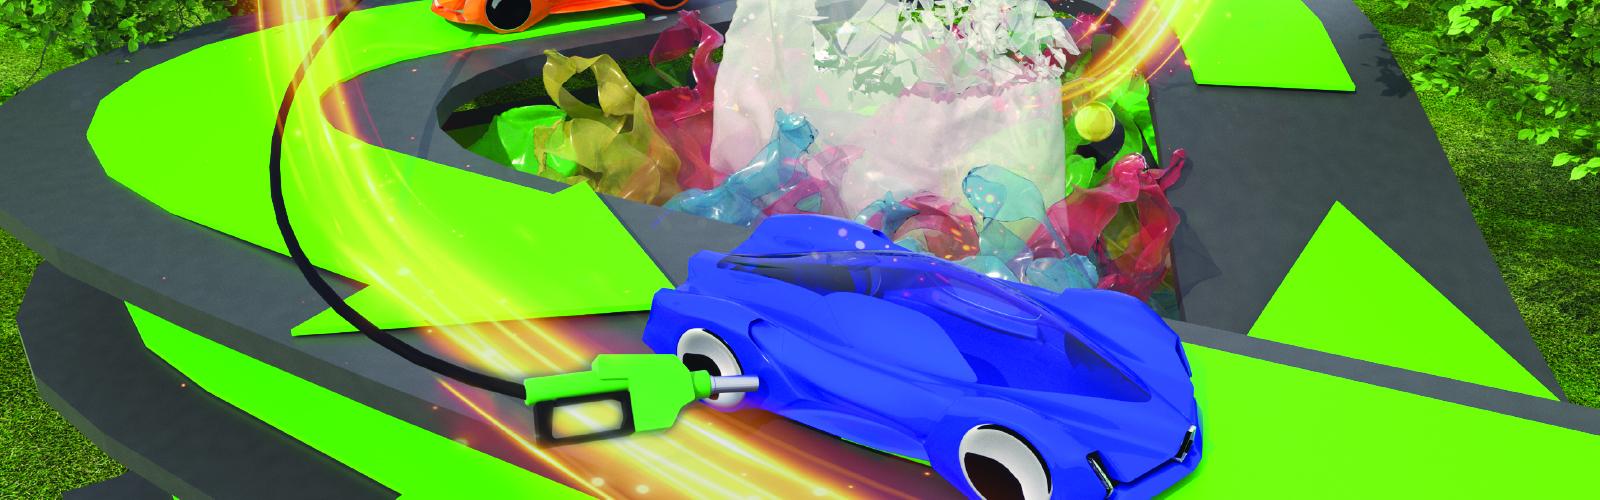 Car 3D graphic